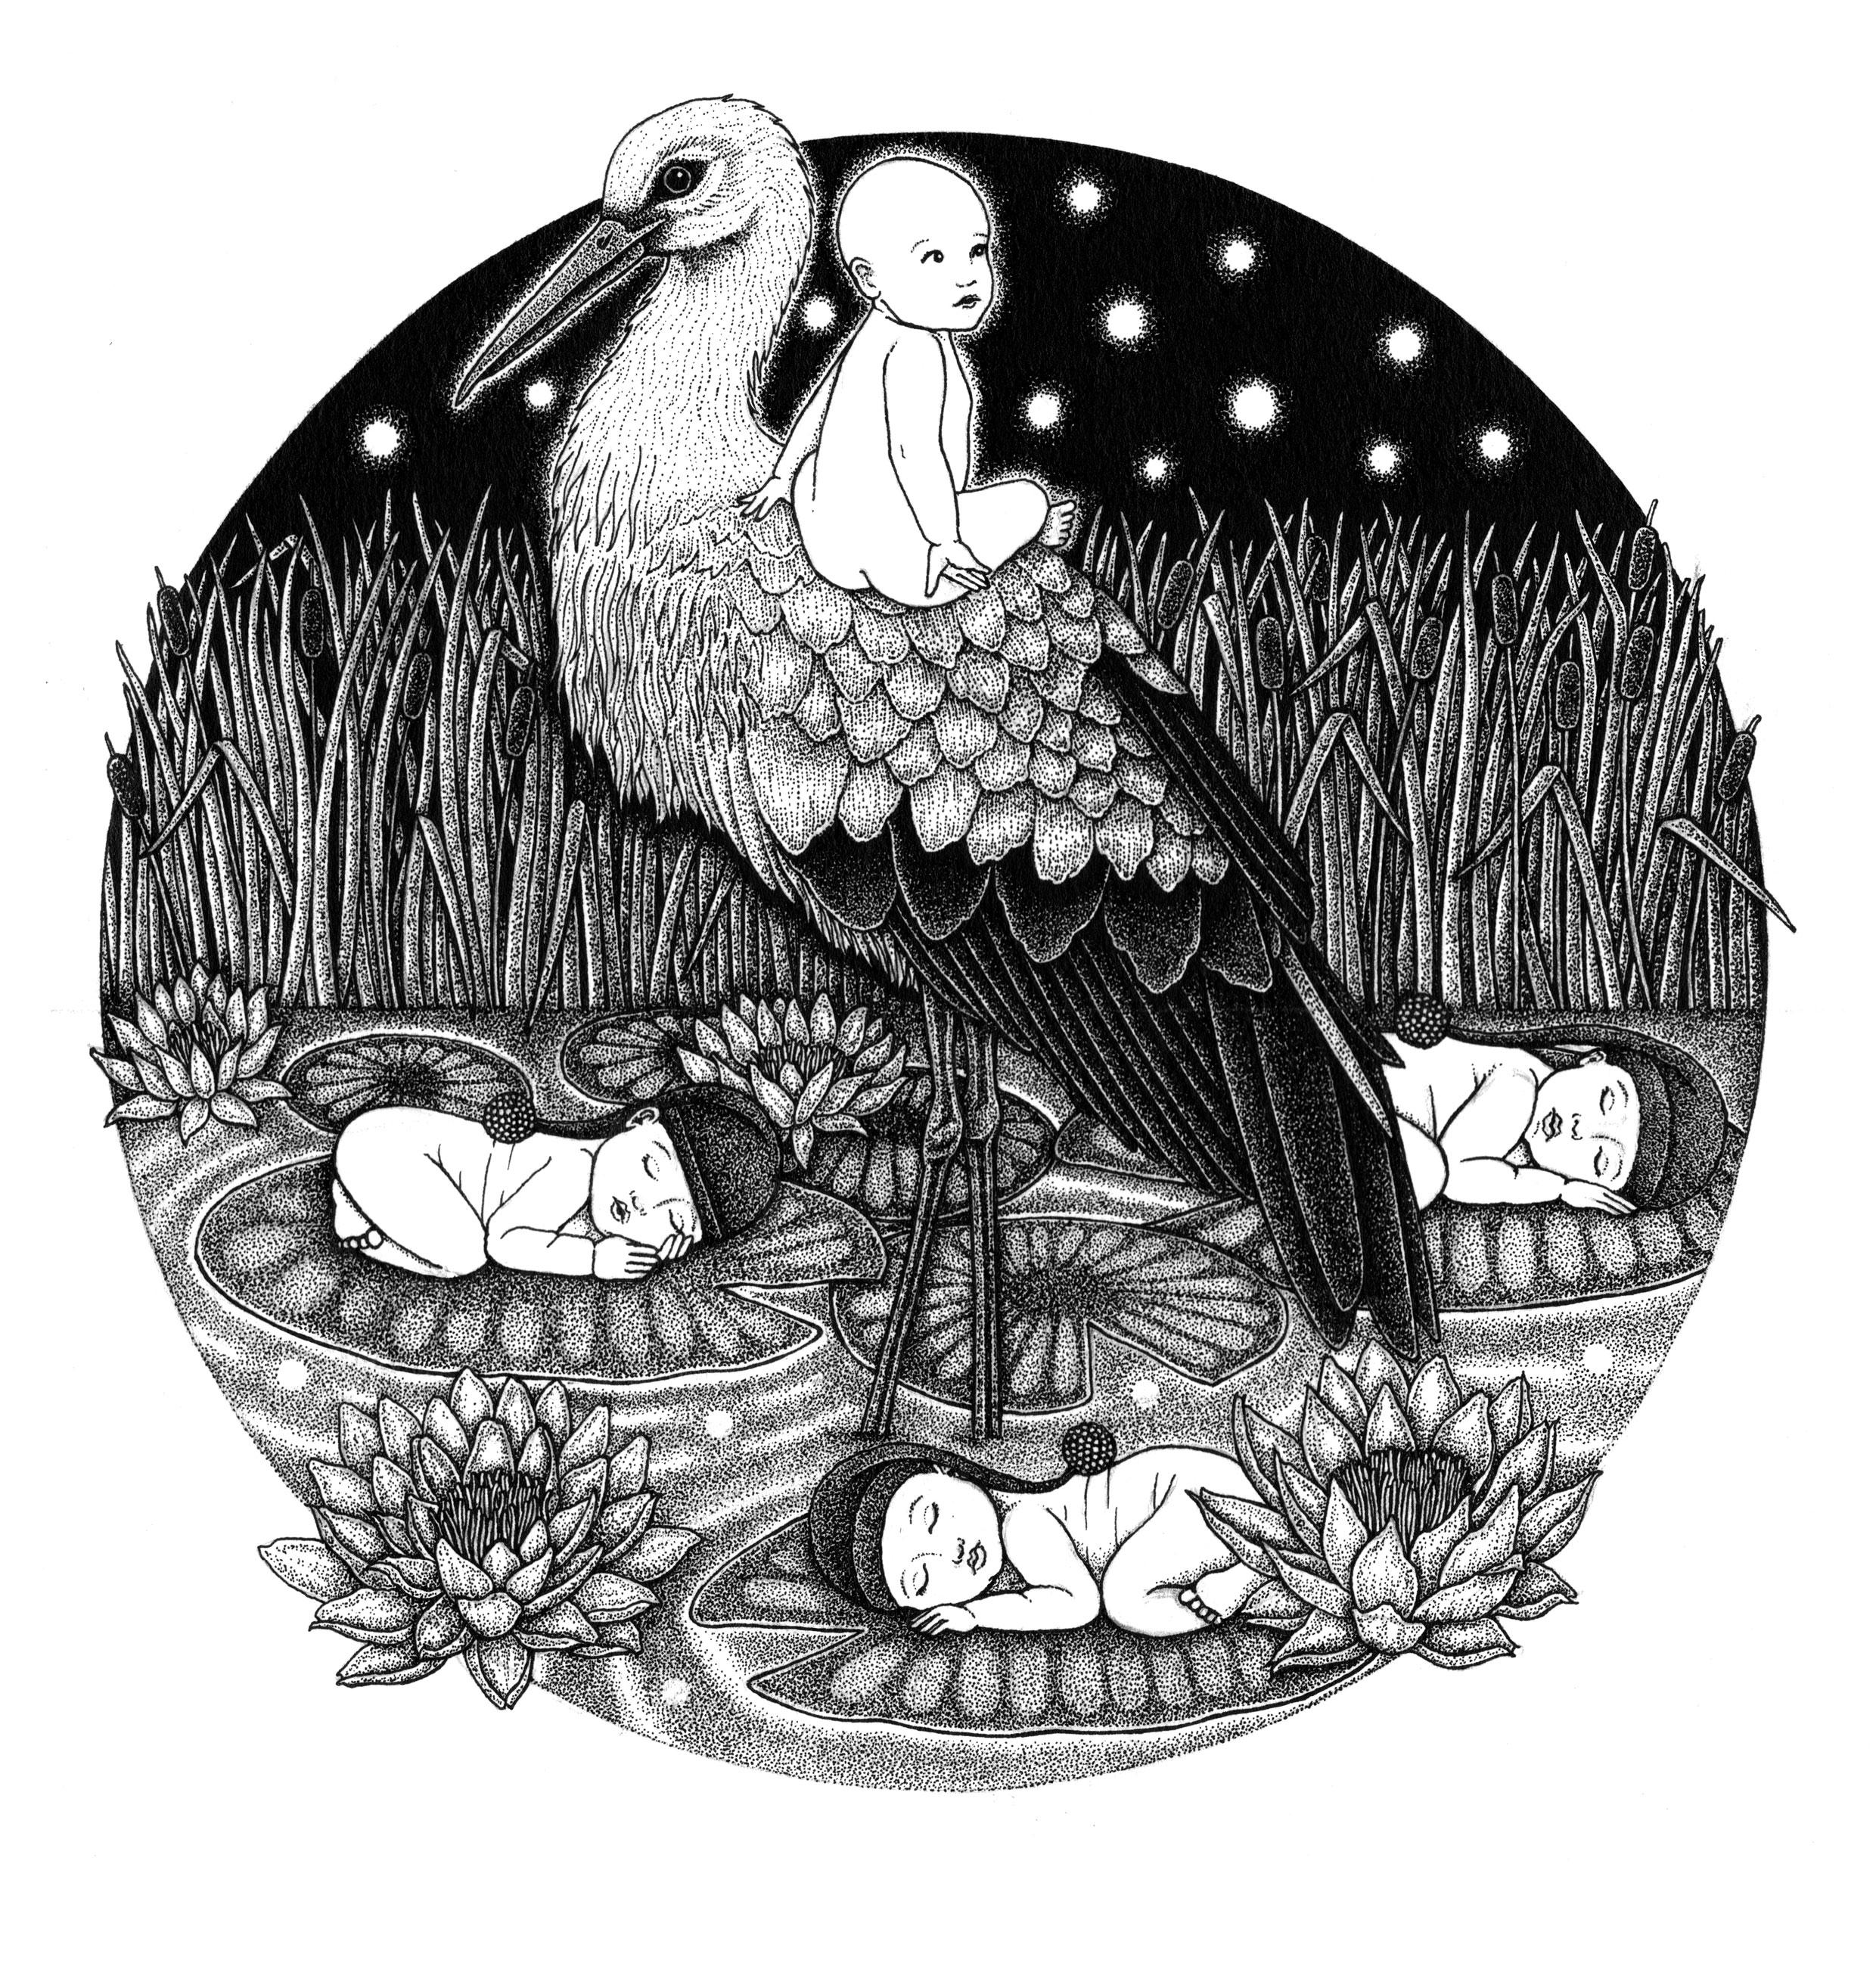 'The Storks'